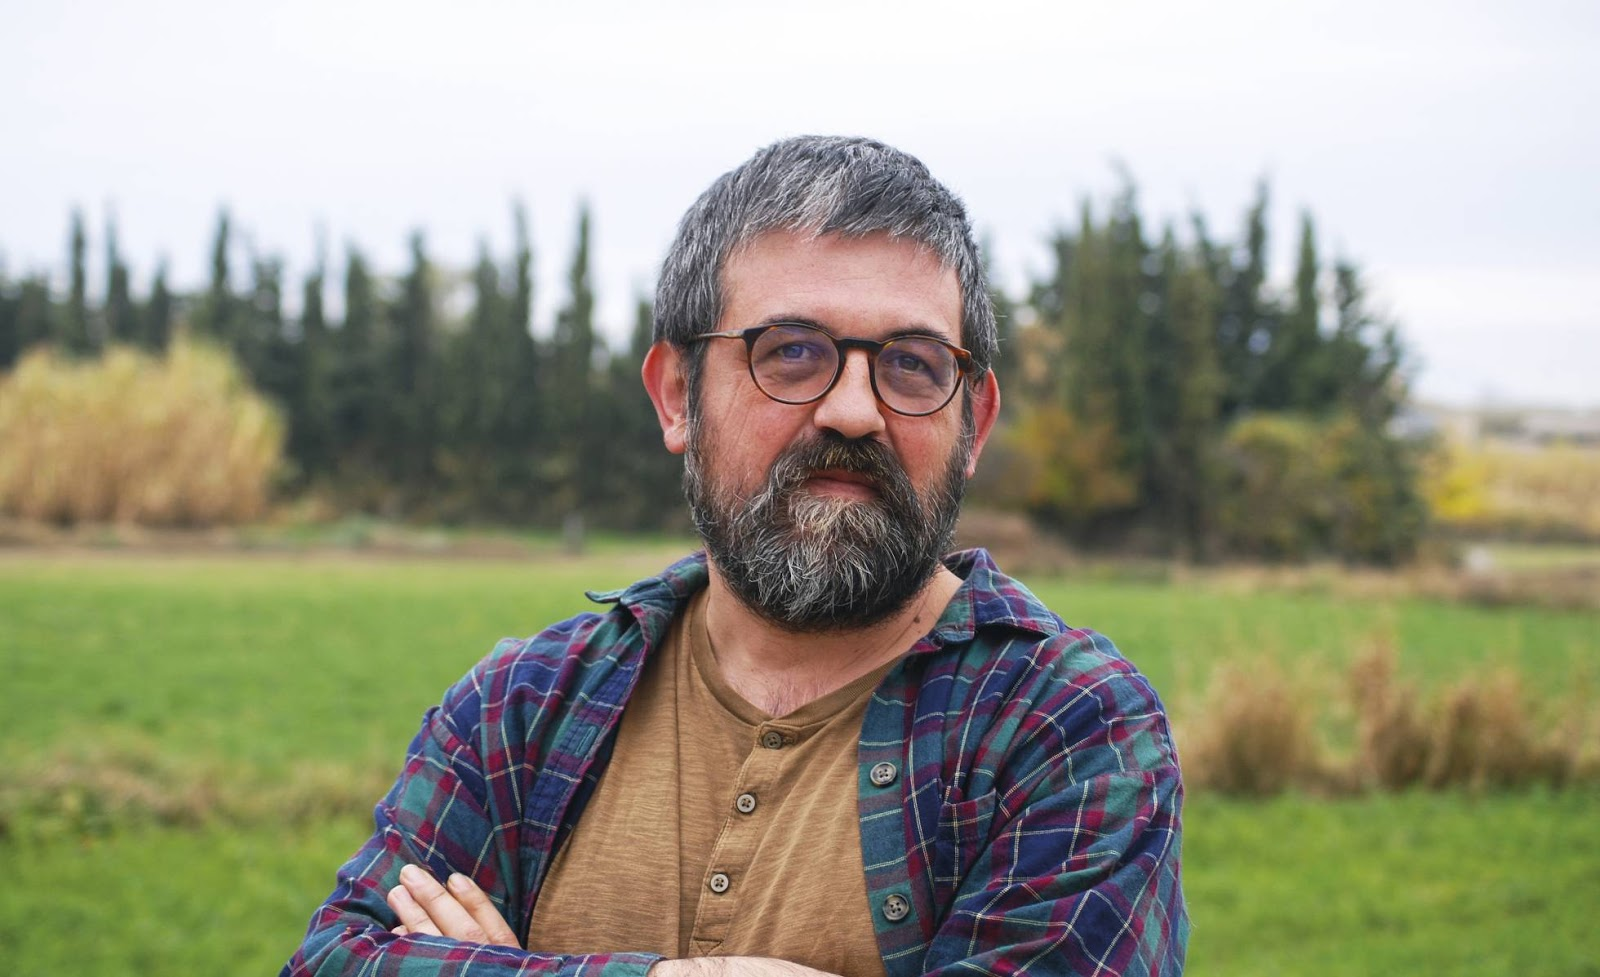 Entrevista con Paco Inclán